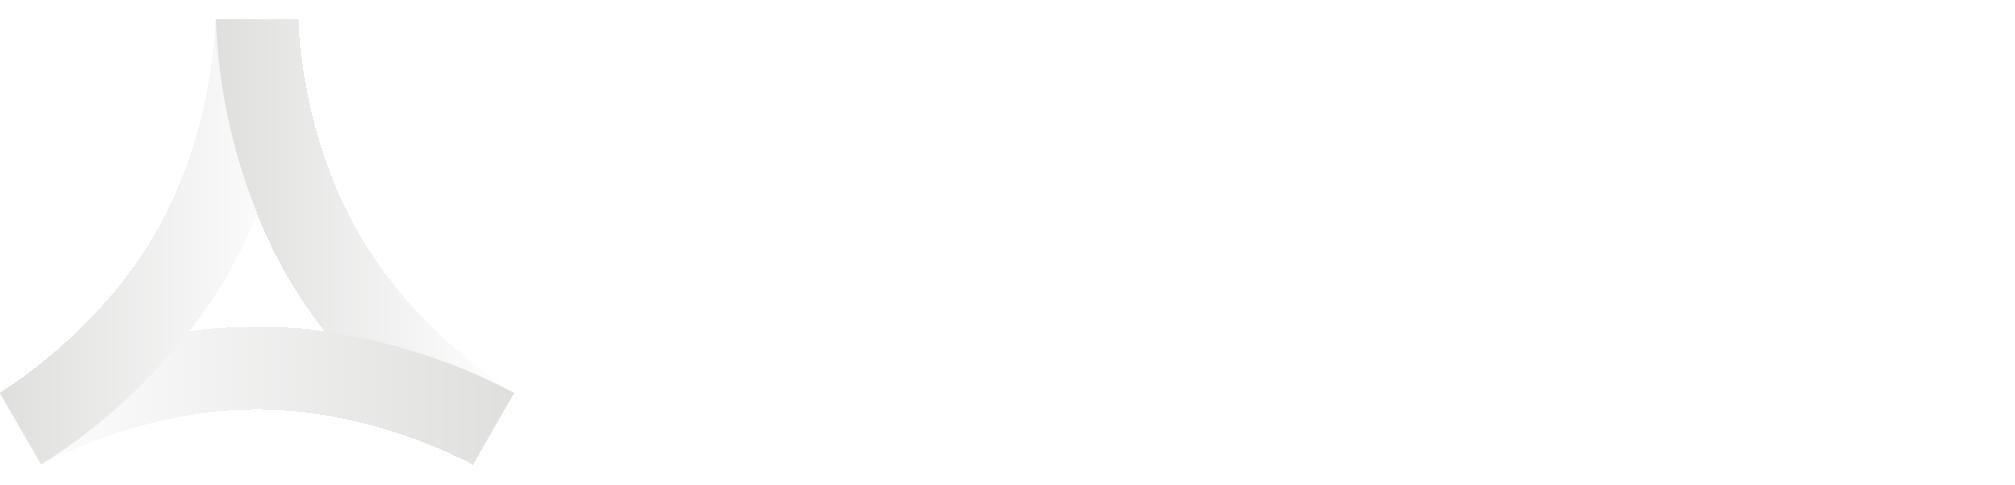 academy-consult-header3